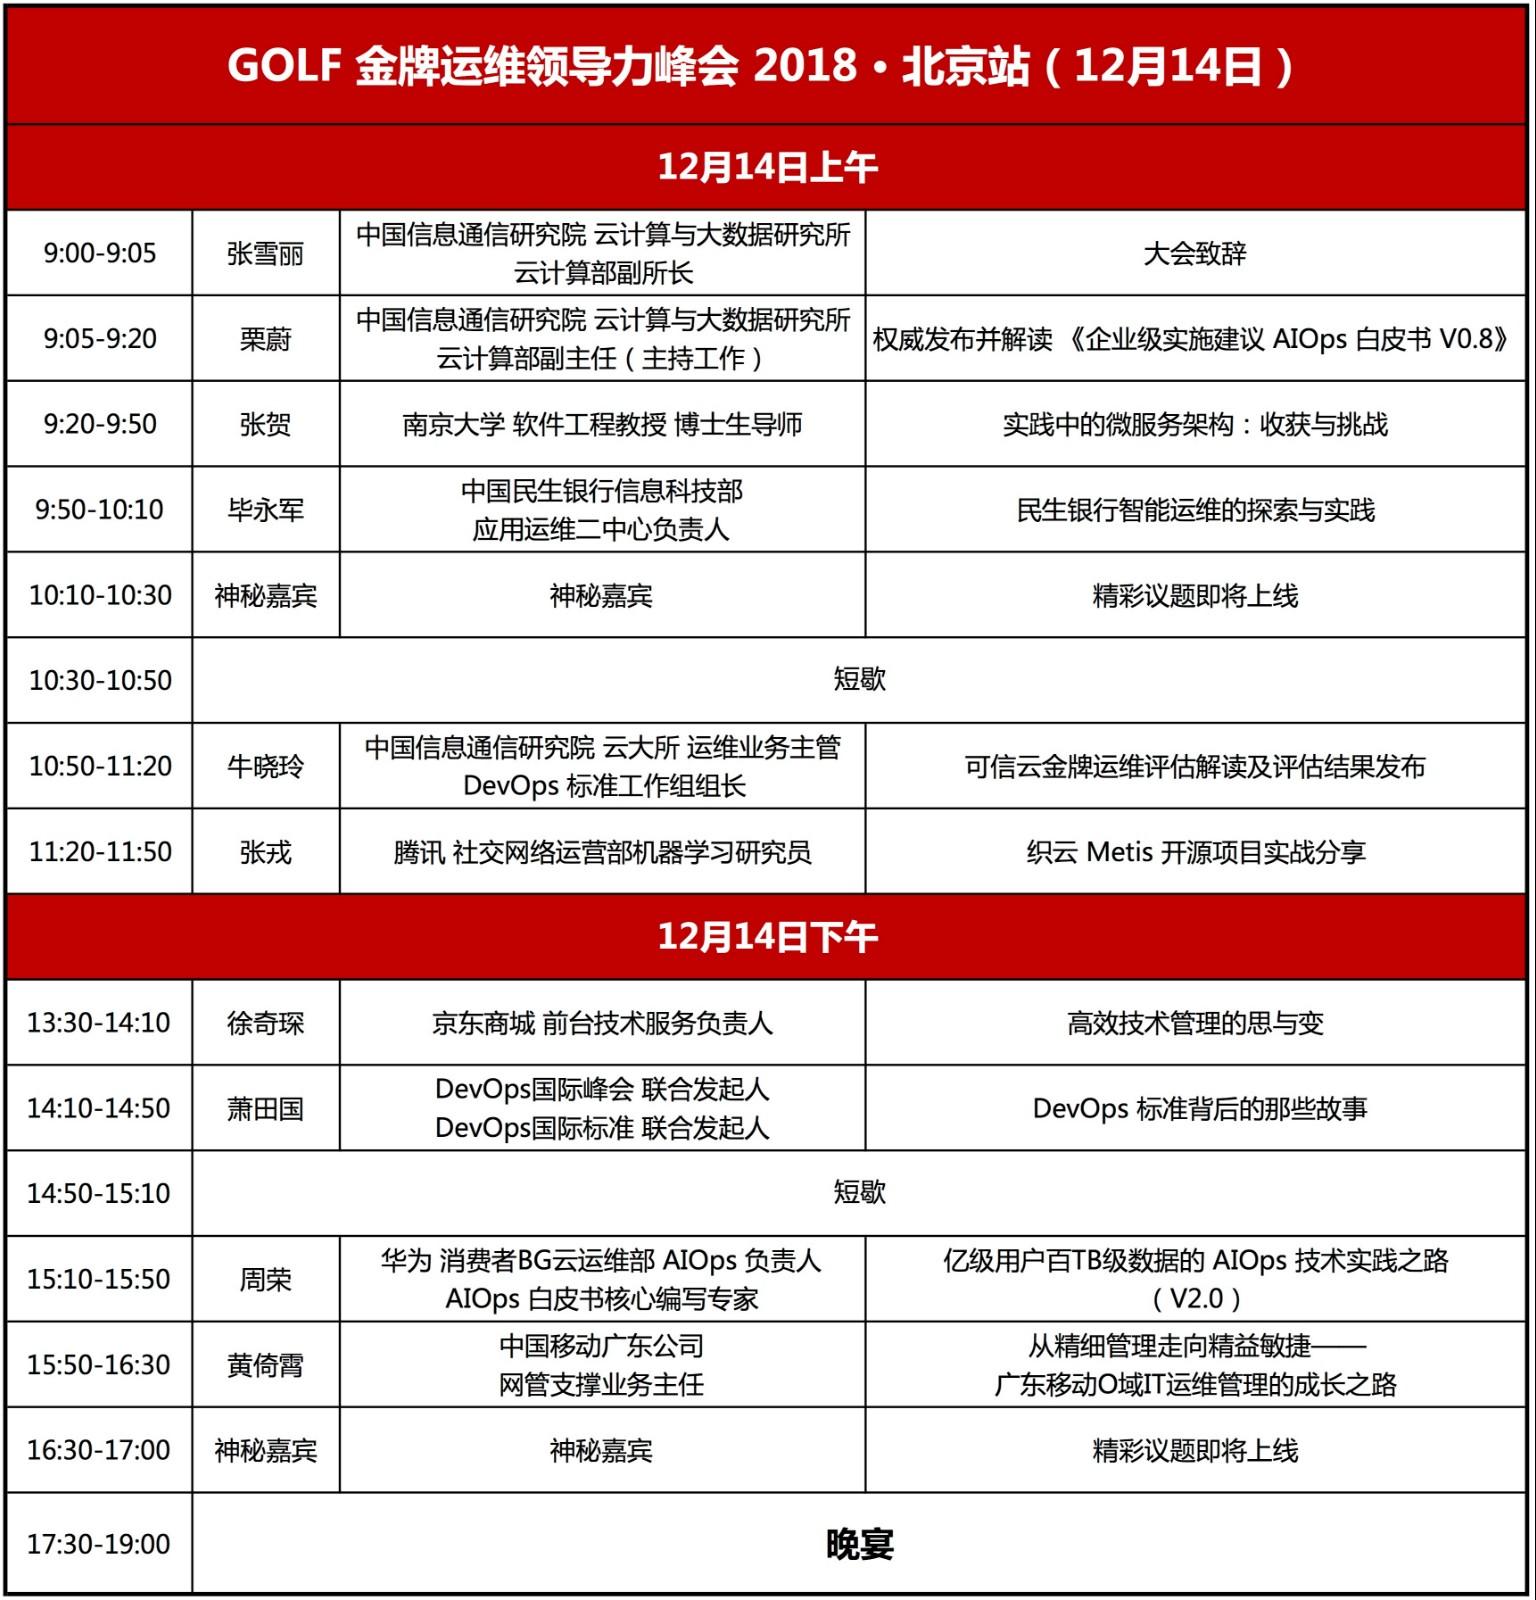 GOLF 金牌运维领导力峰会 -1116.jpg